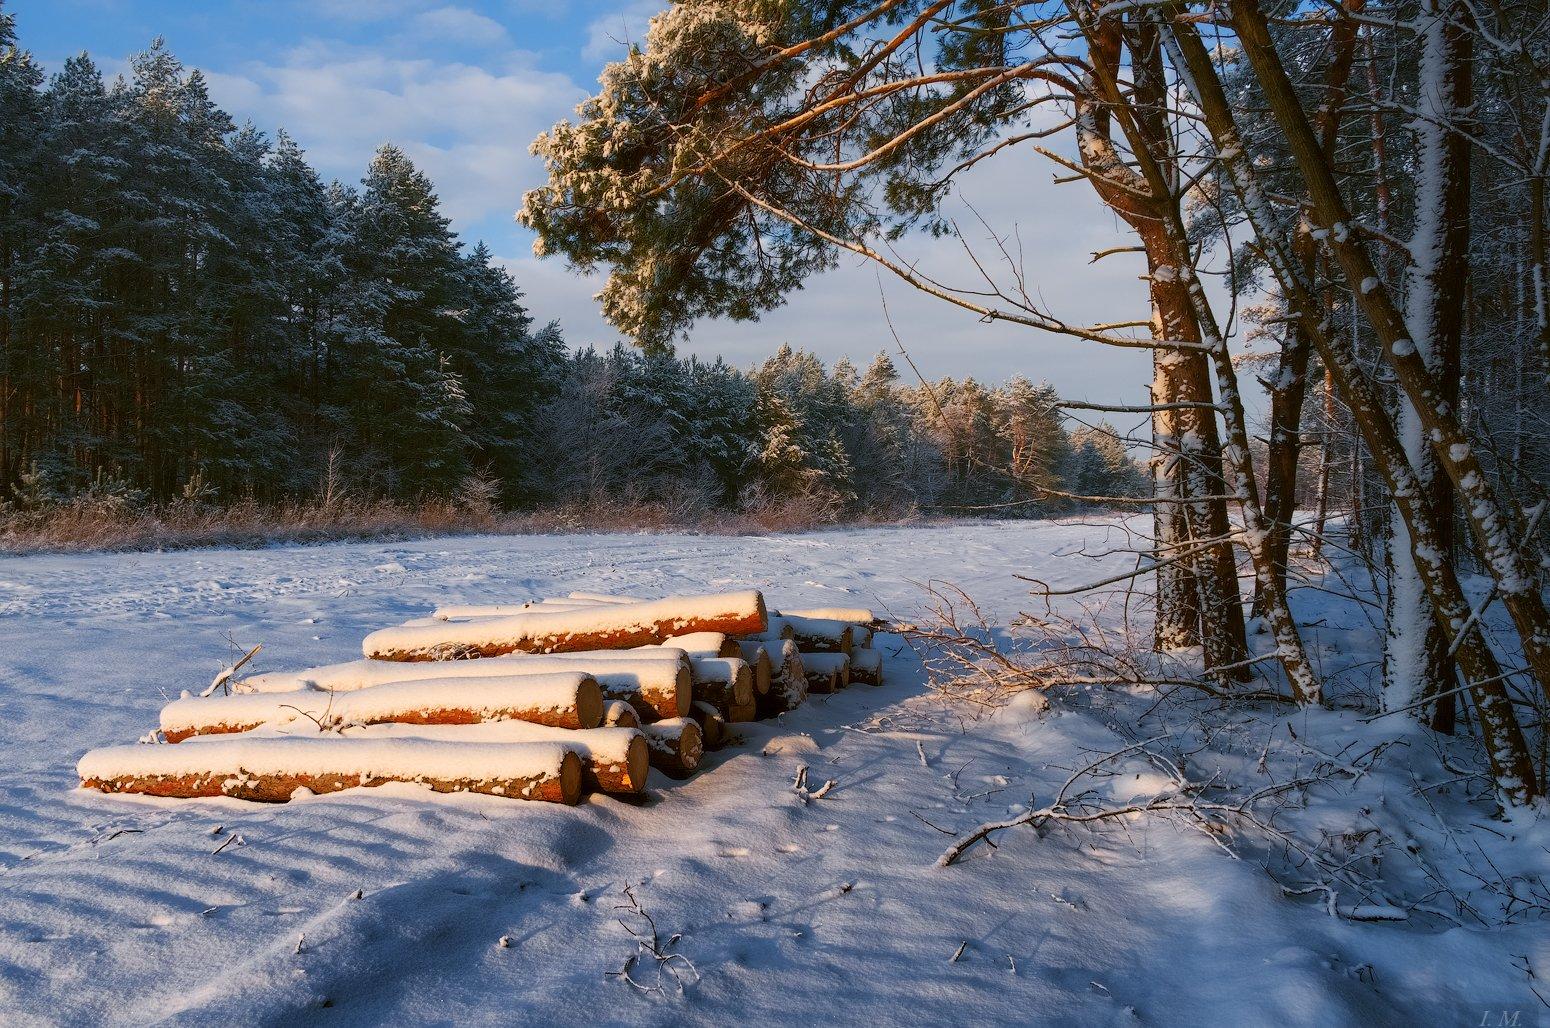 утро, деревья, зима, лес, пейзаж, снег, сосновый лес, опушка, pine, cold, forest, light, morning, snow, winter, trees, colors, Ivan Maljarenko